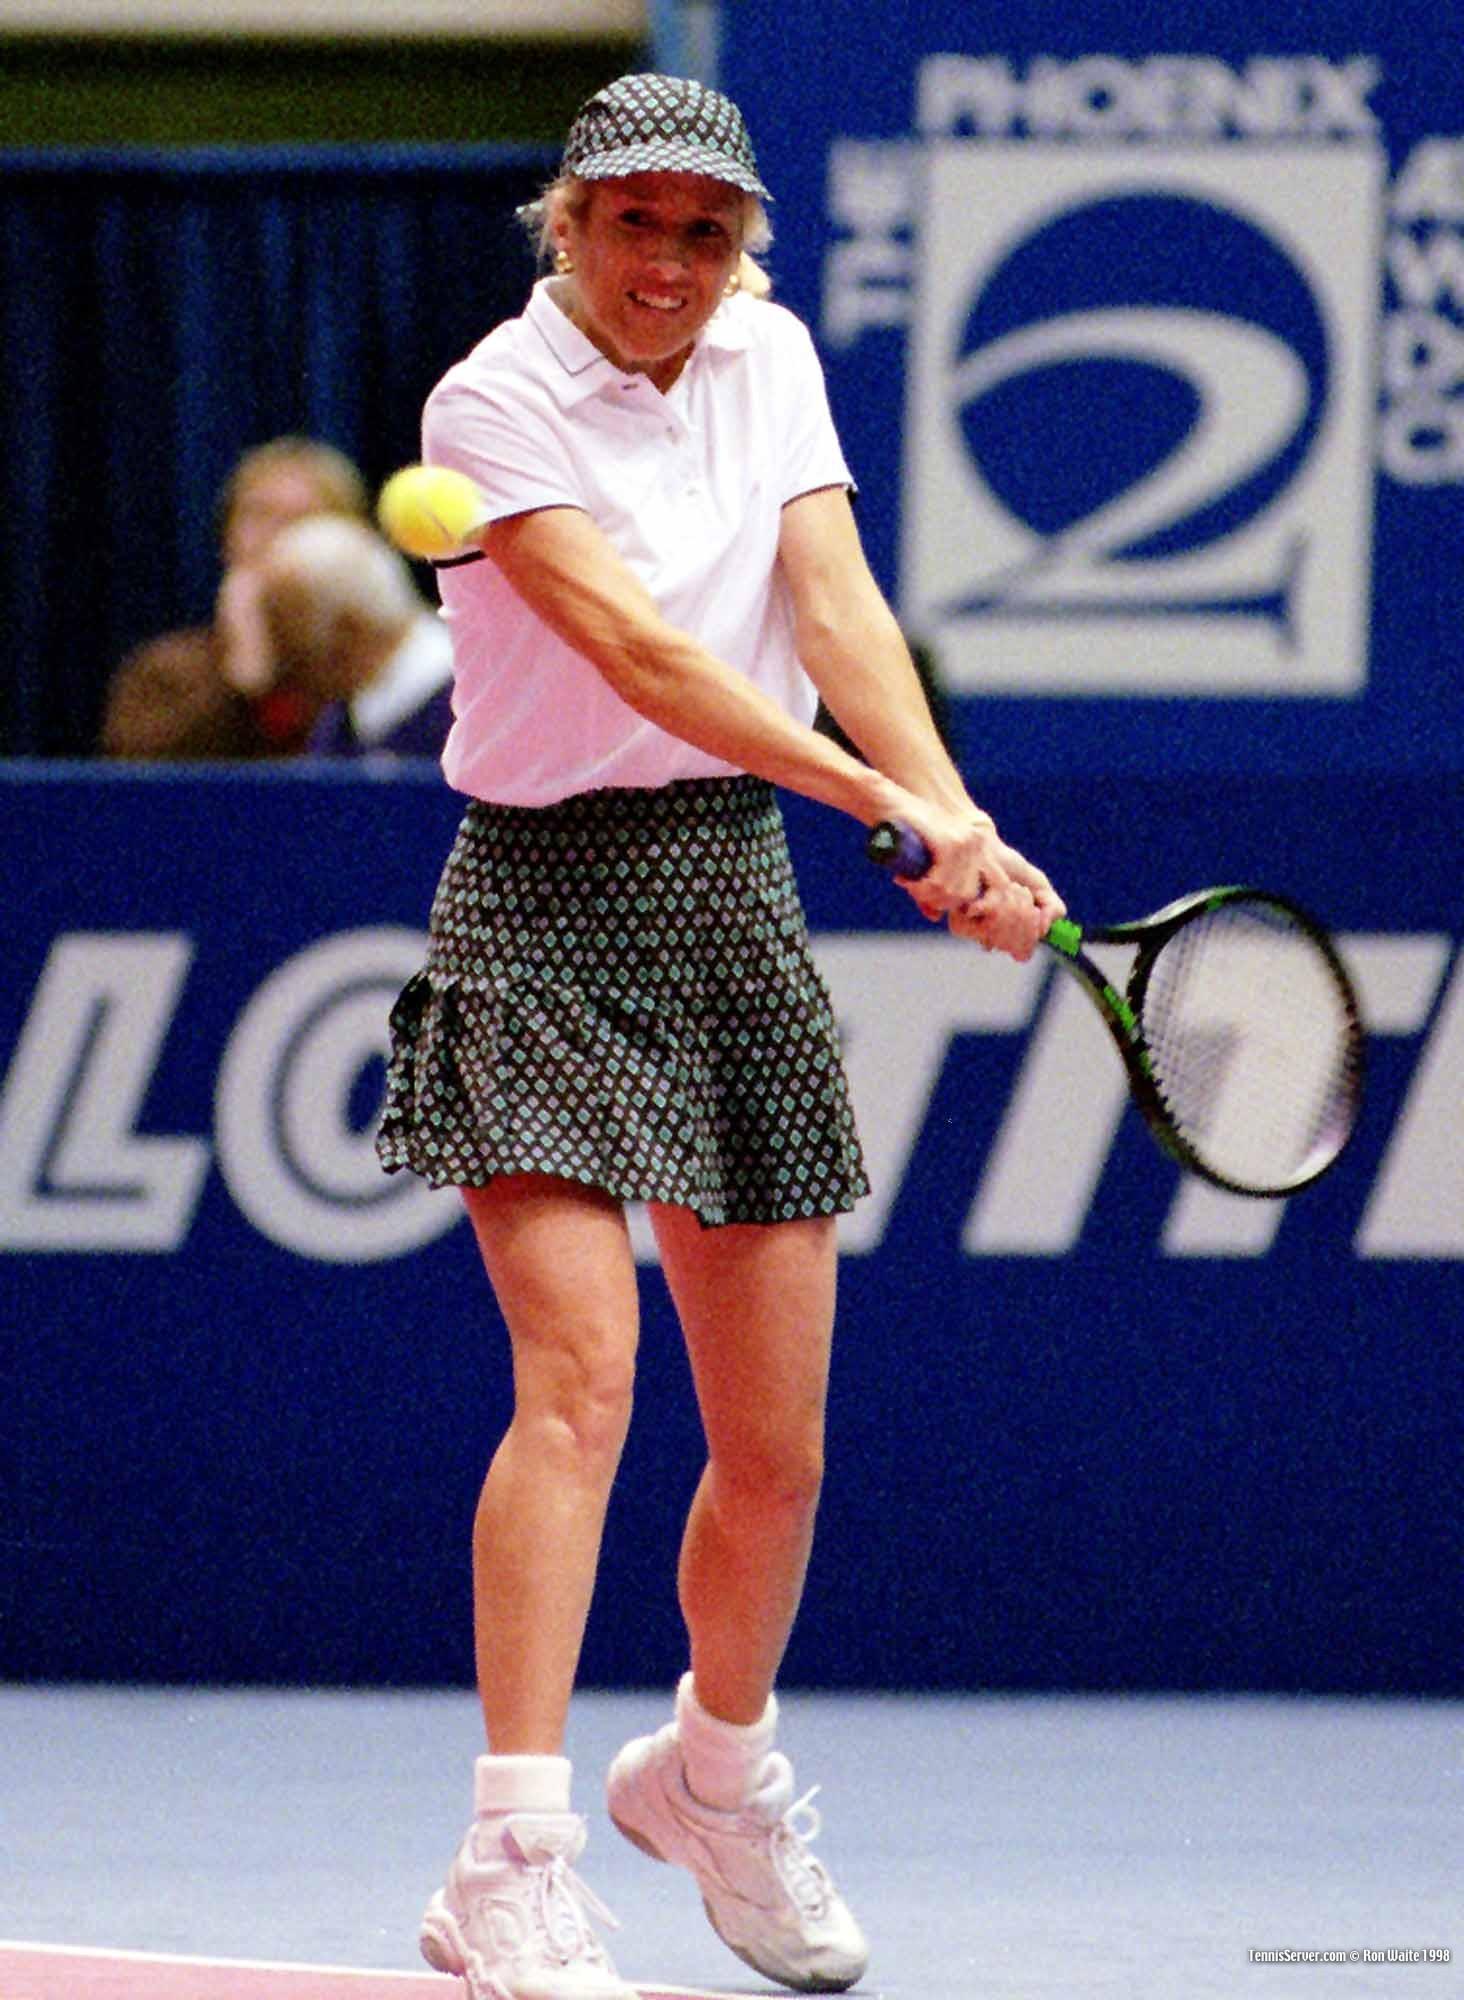 Tennis Server ATP WTA Pro Tennis Showcase Legends of Tennis